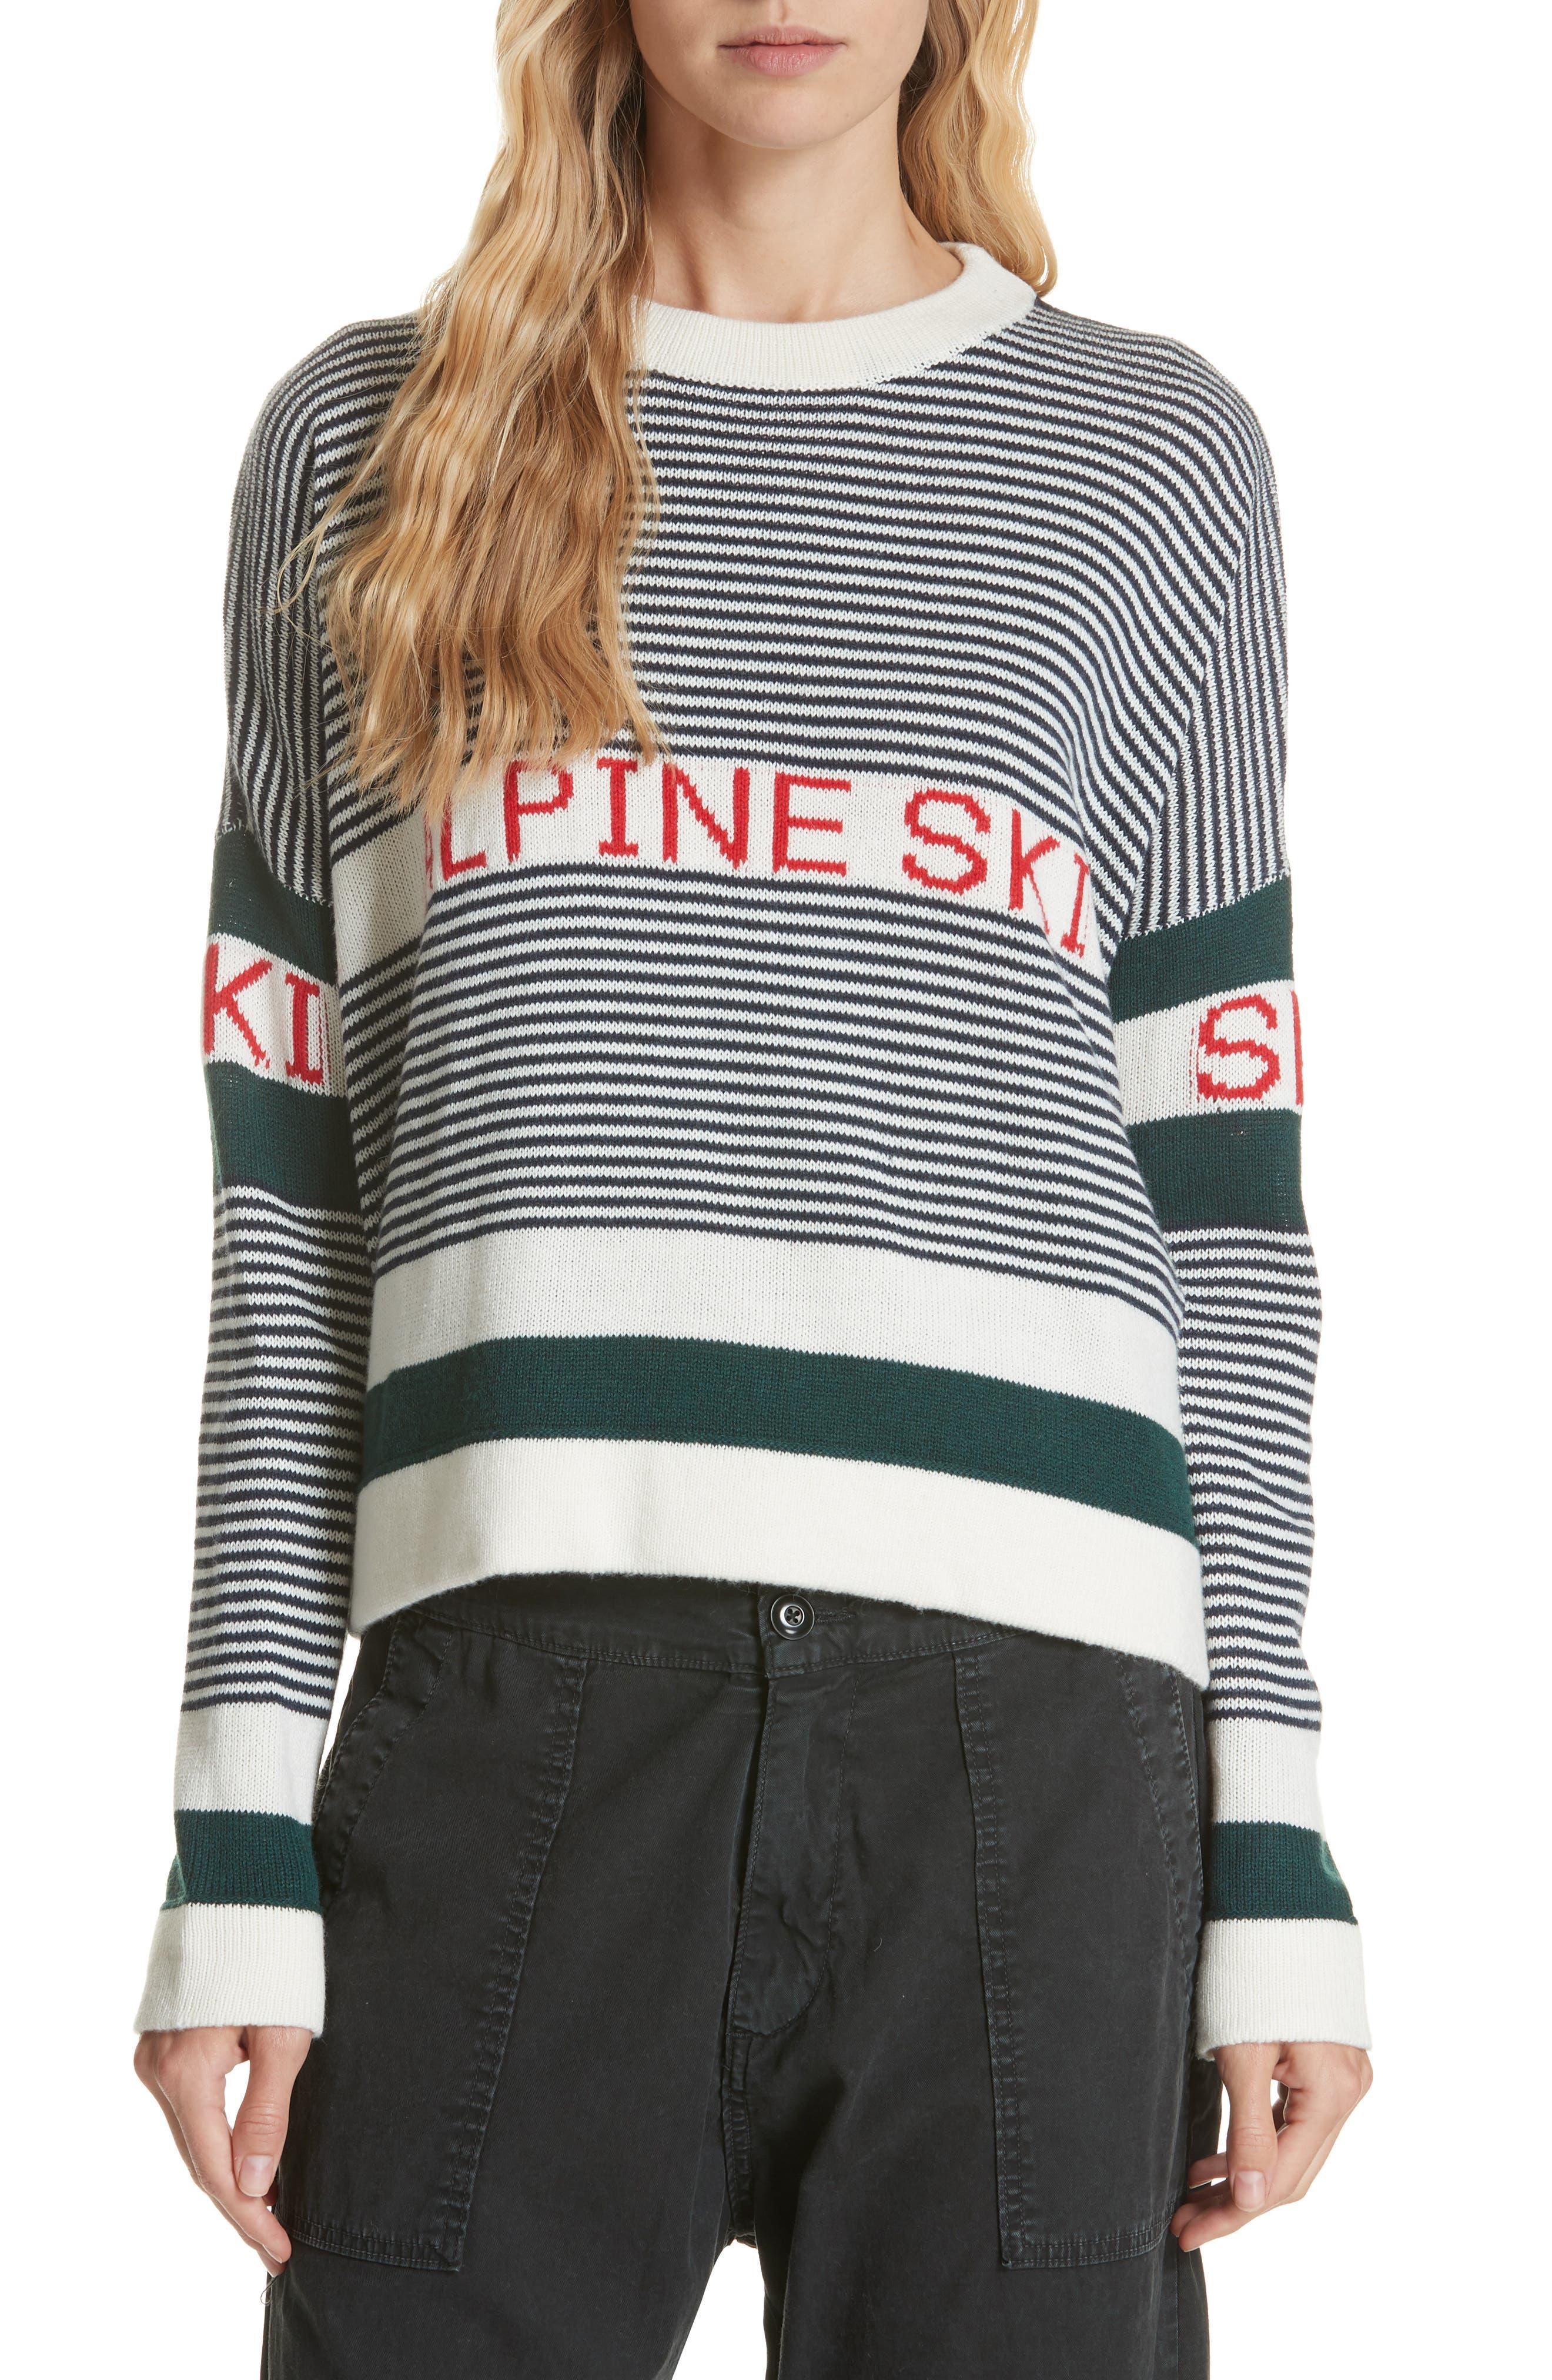 Alpine Ski Sweater,                             Main thumbnail 1, color,                             MULTI STRIPE